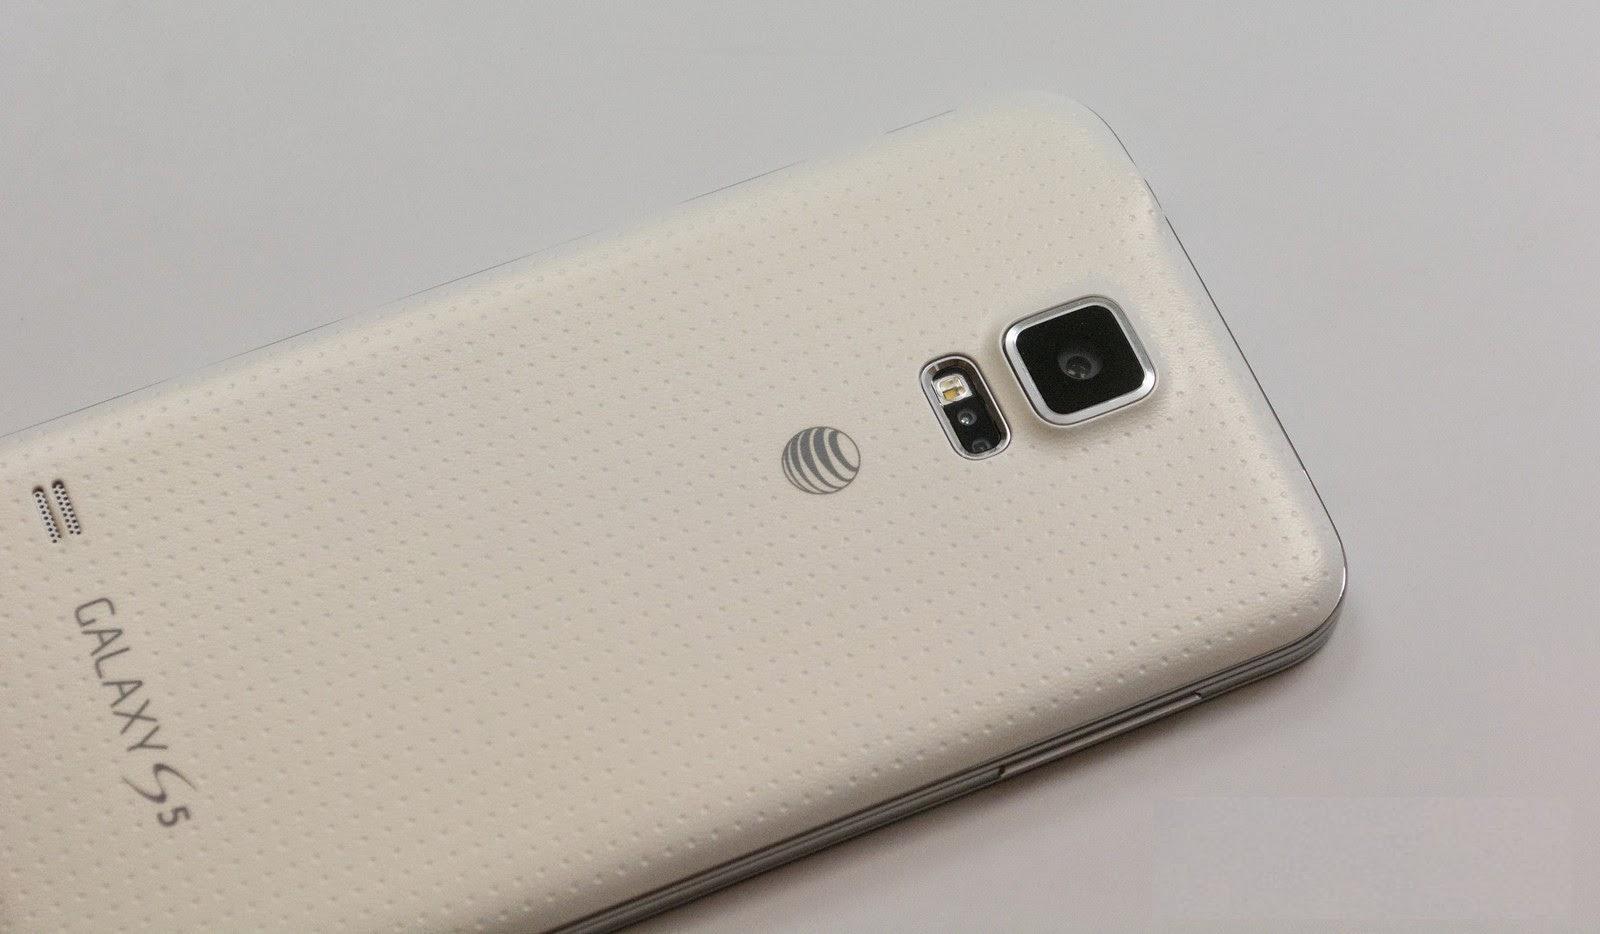 Samsung Galaxy S5 Android 4.4 KitKat